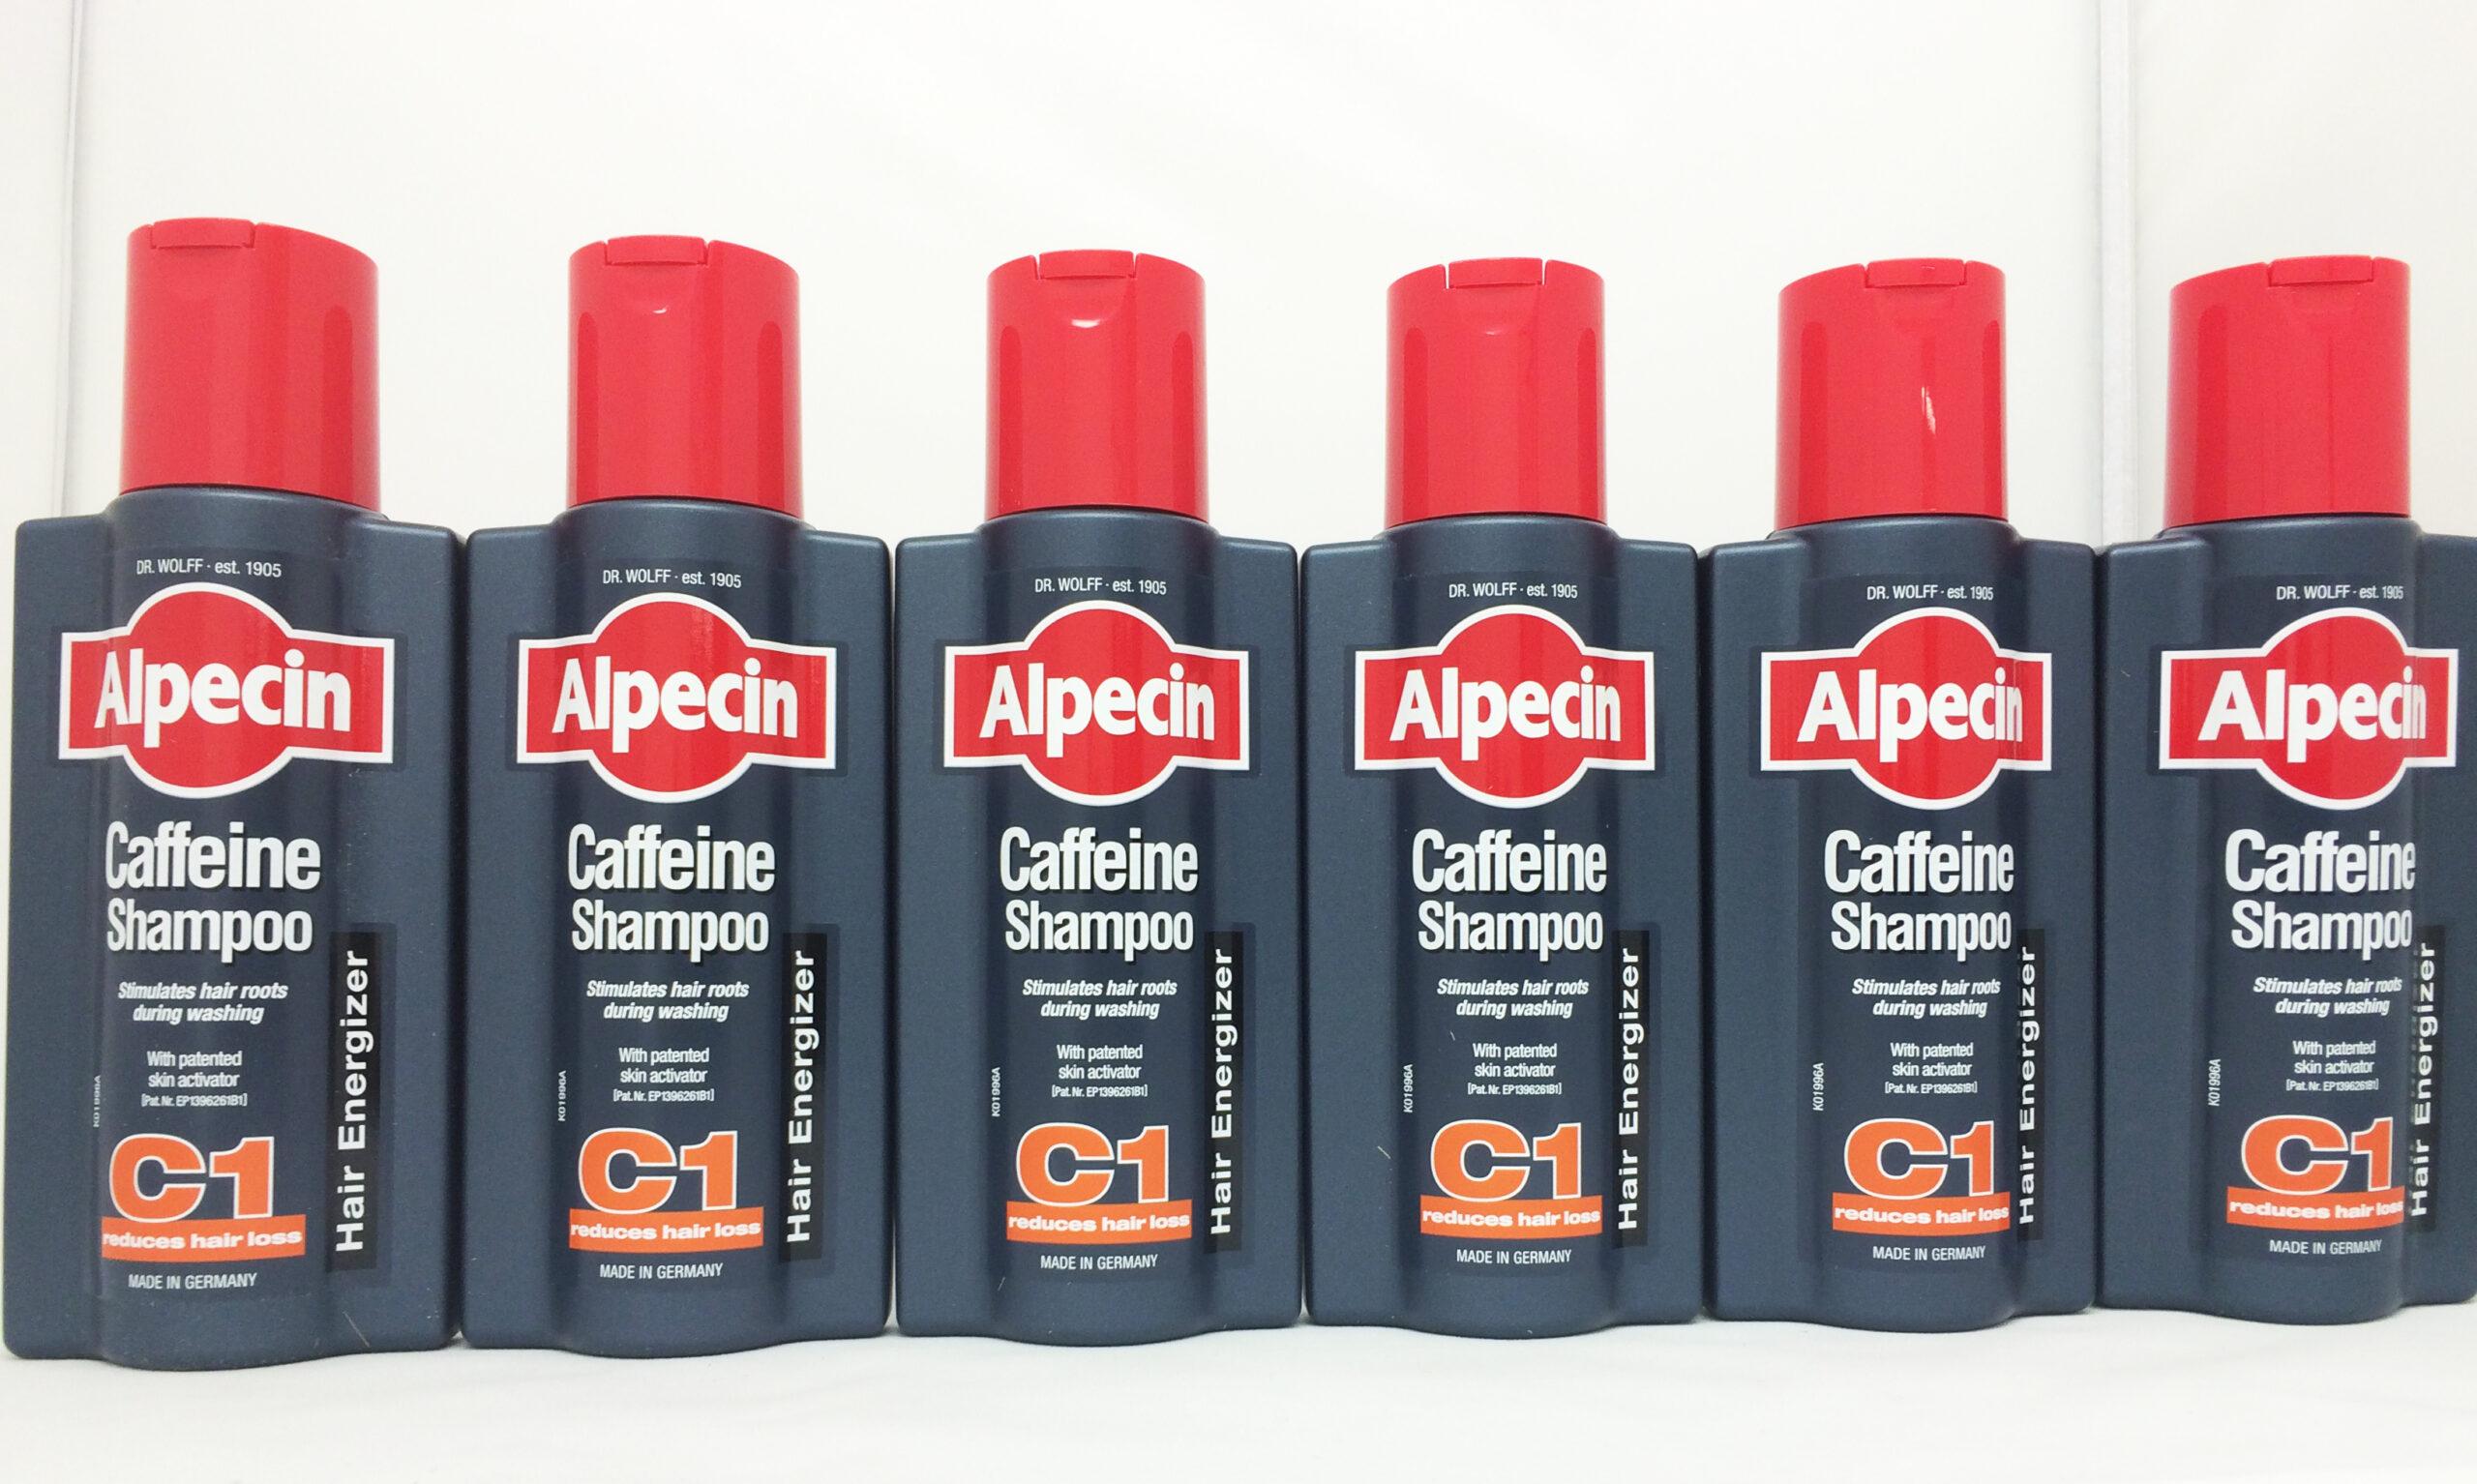 Alpecin Caffeine Shampoo 250ml - pack of 6 **MULTIPACK - SAVE MONEY**